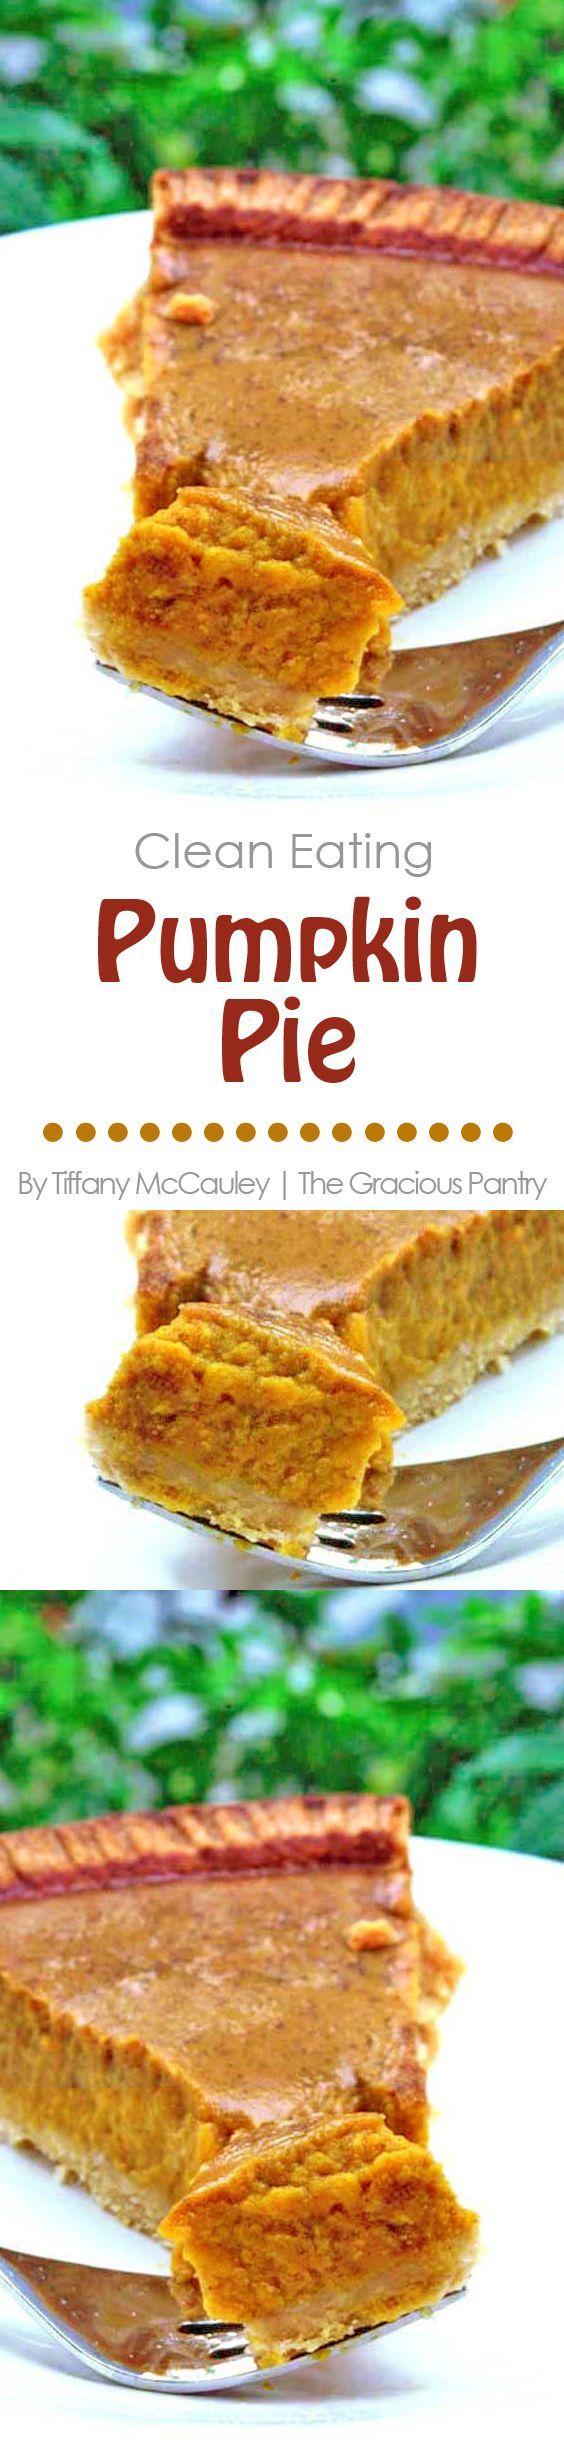 Clean Eating Pumpkin Pie | Pie | Recipes | Clean Eating | Healthy Desserts